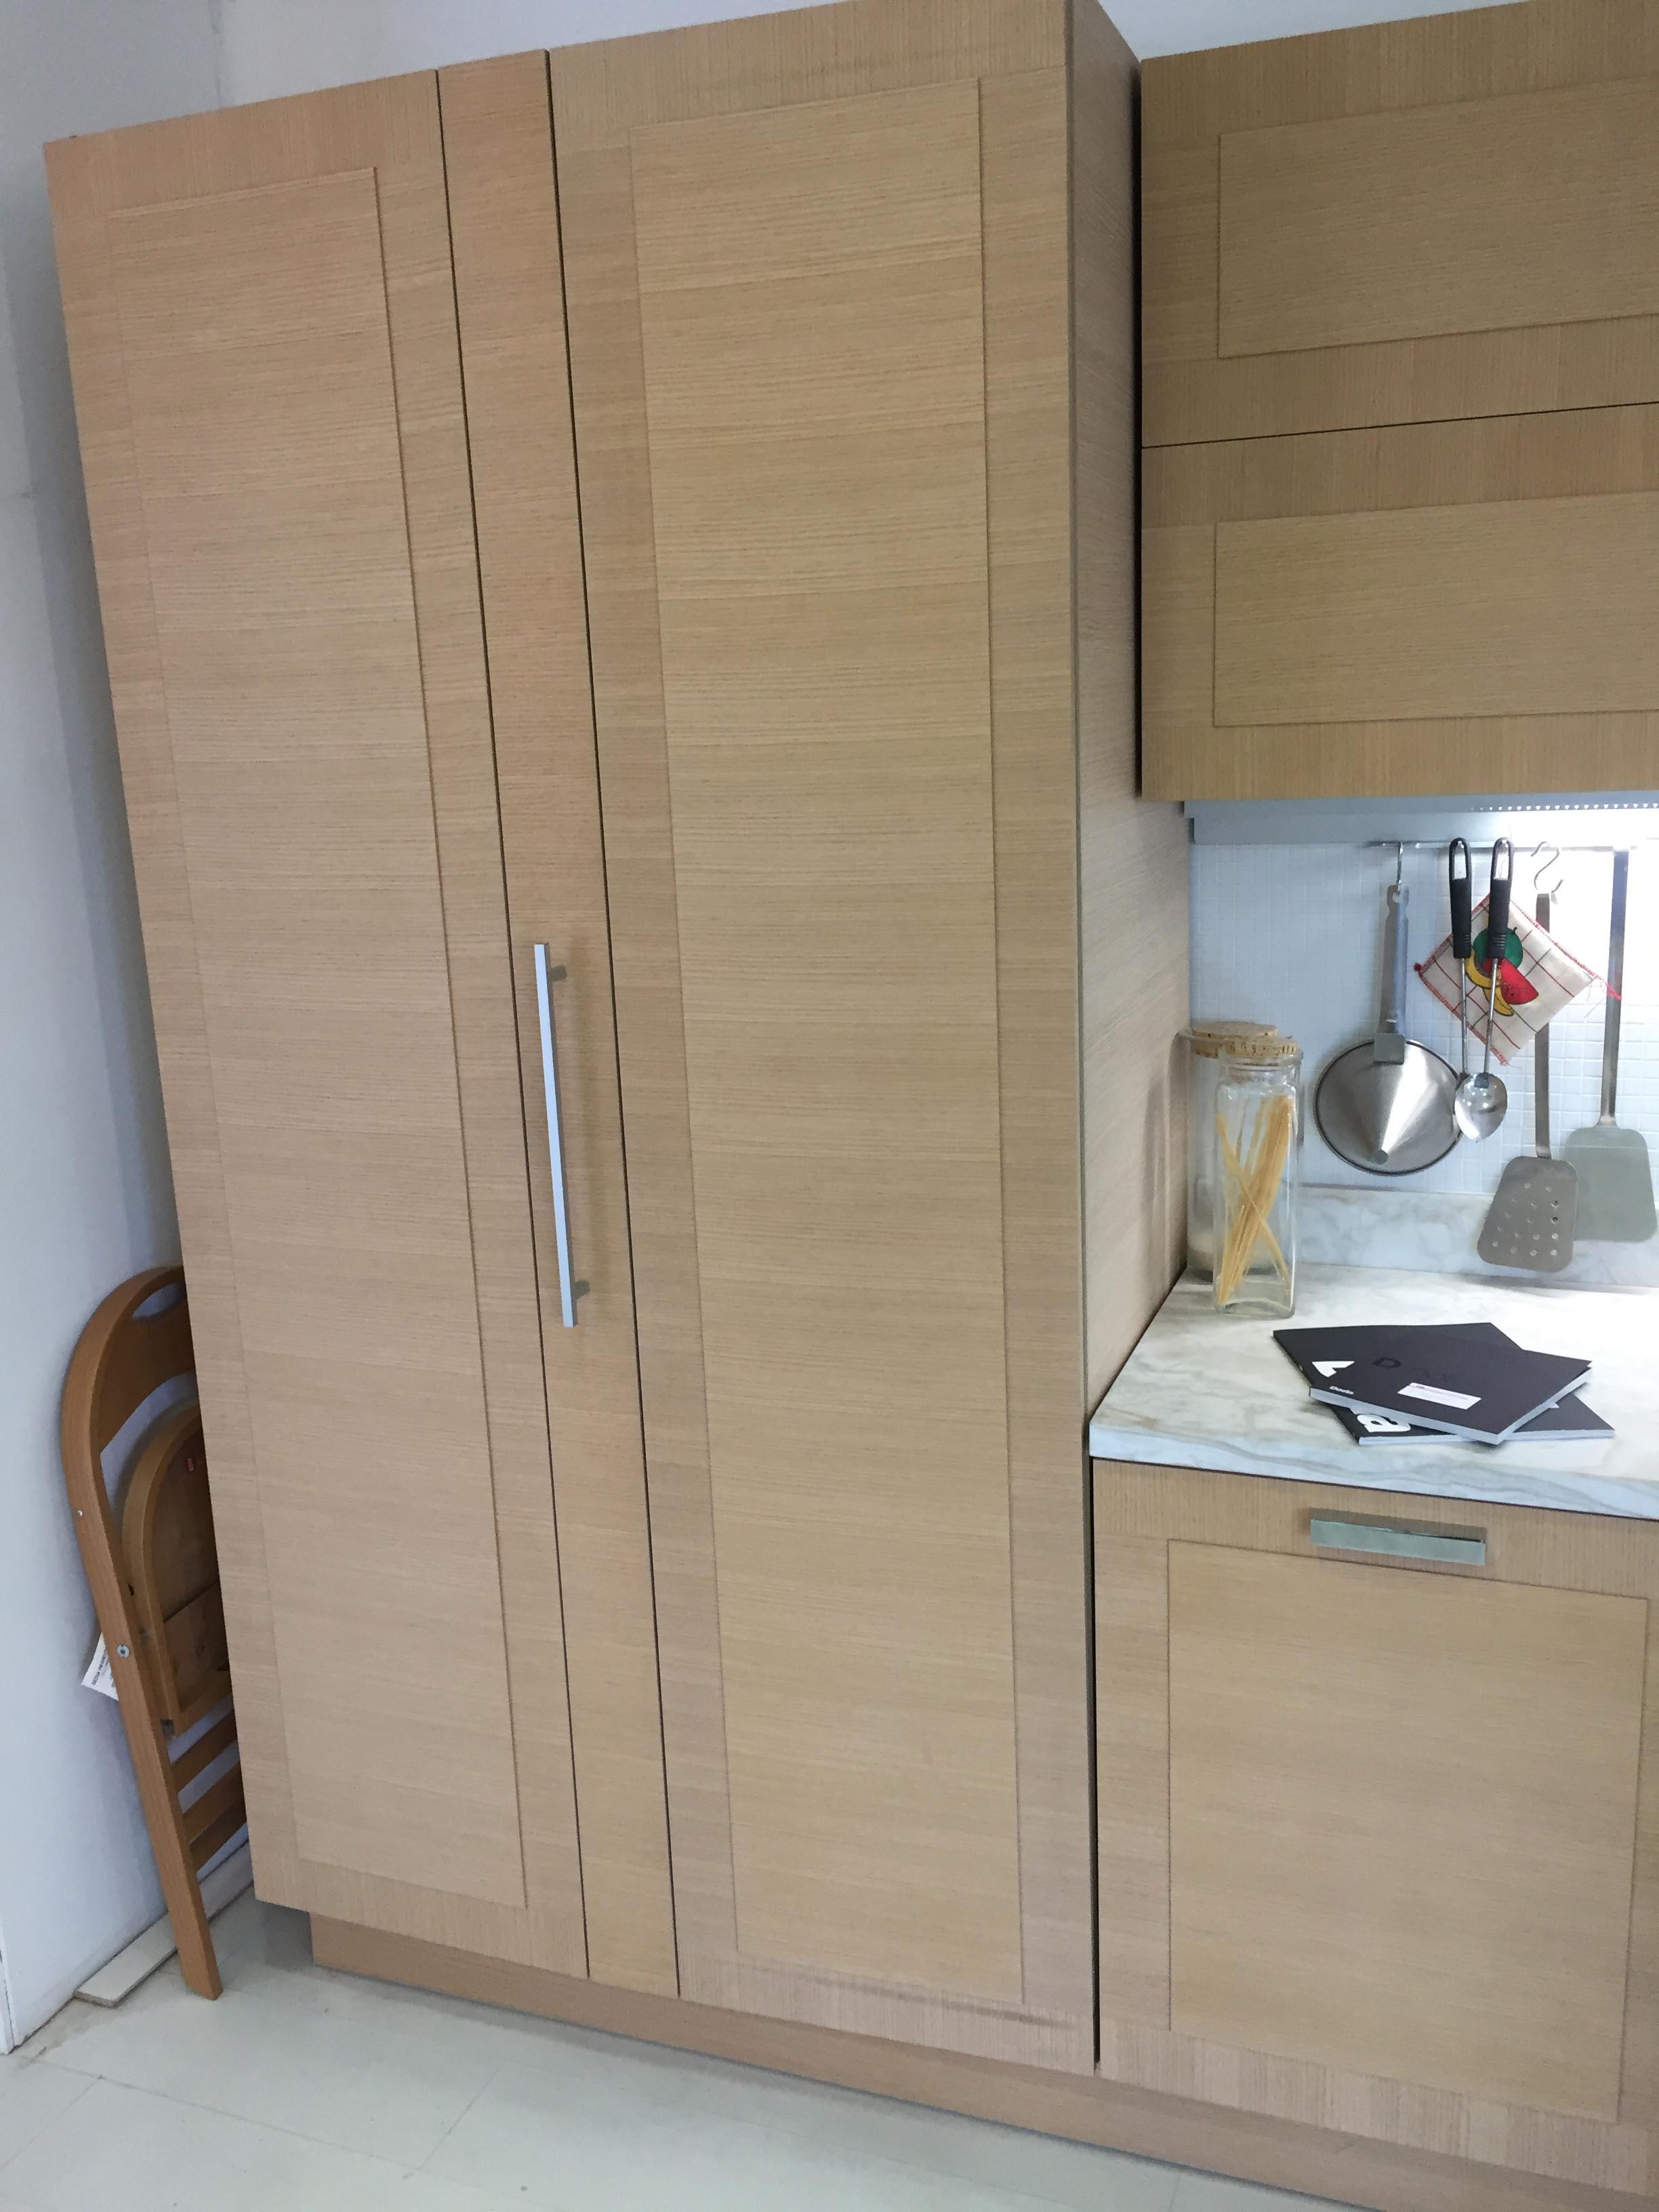 Emejing Cucine Rovere Naturale Ideas - Home Design Ideas 2017 ...